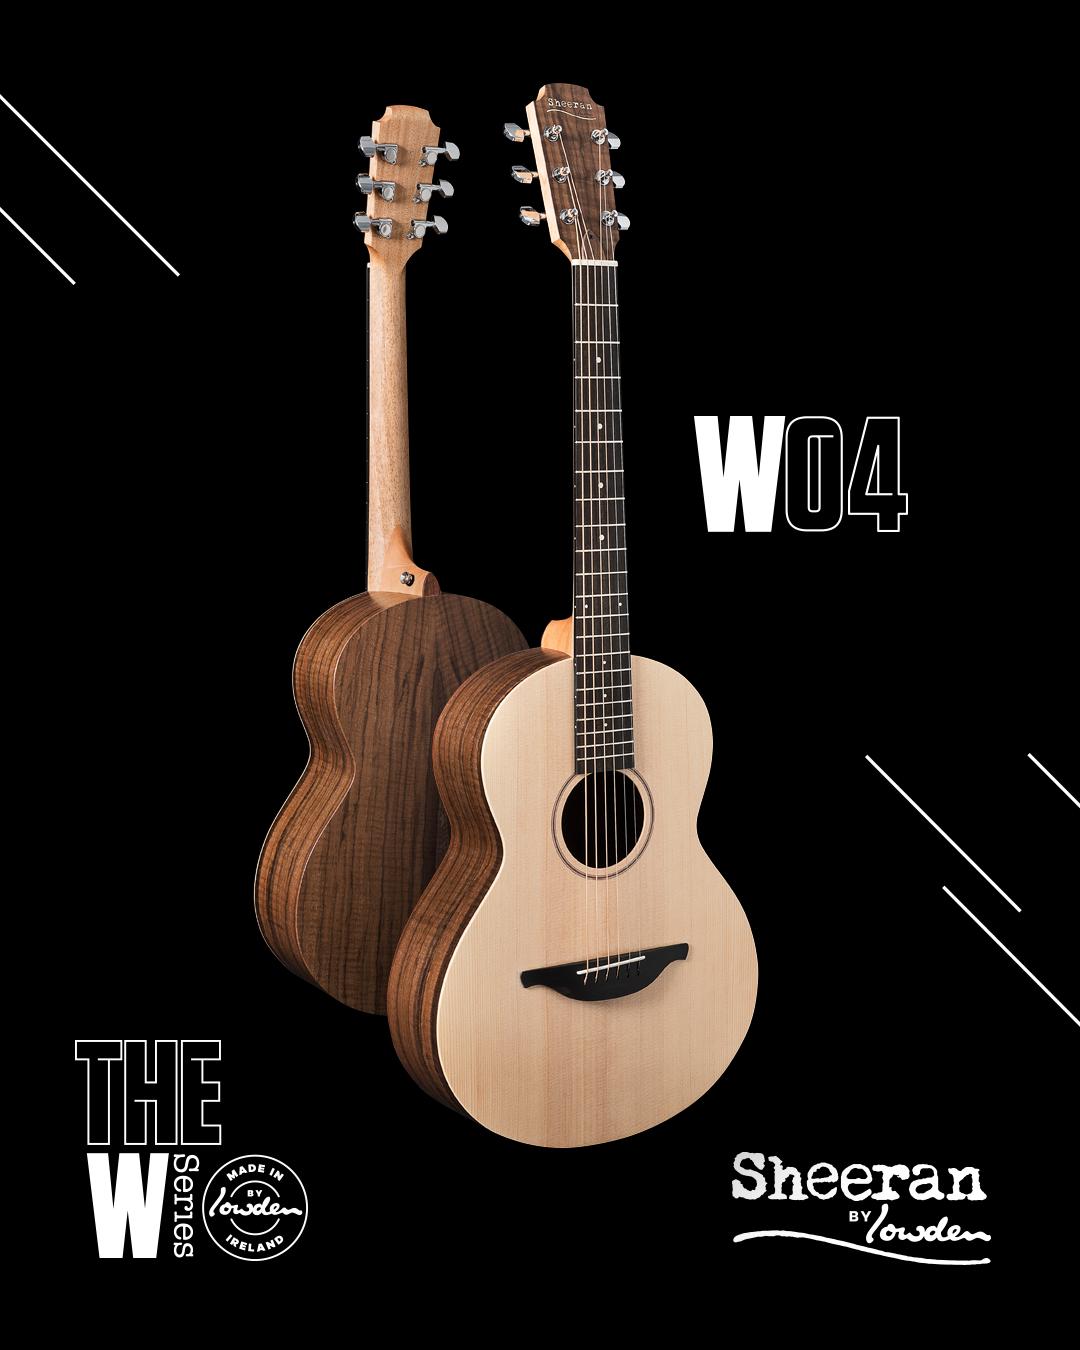 Sheeran W04 PRE ORDER